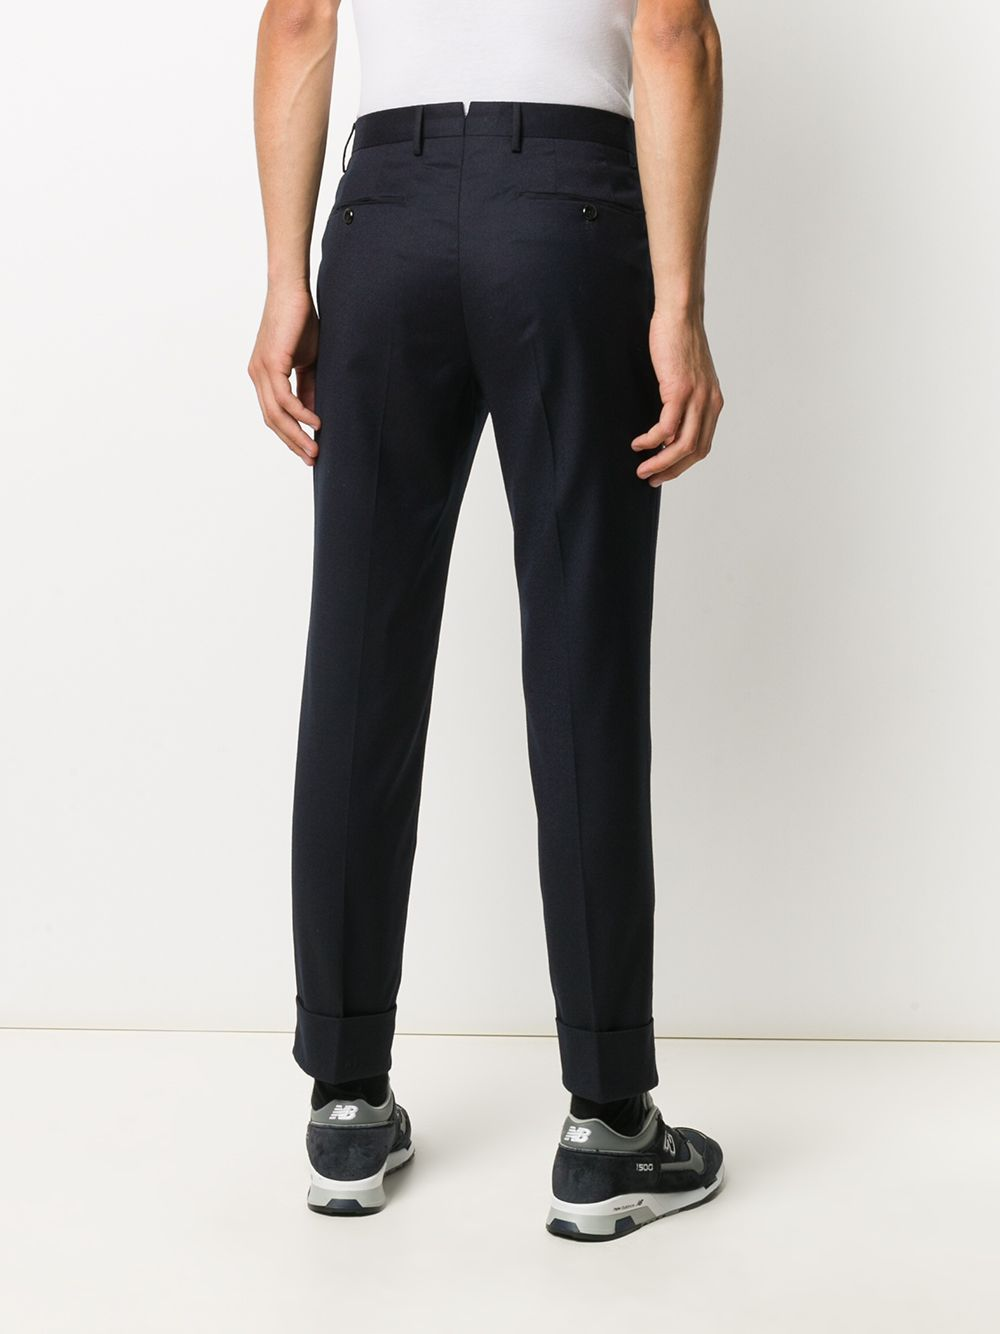 Navy blue virgin wool blend pleat-detail trousers  PT01 |  | COAFFKZ00CL1-CM130360